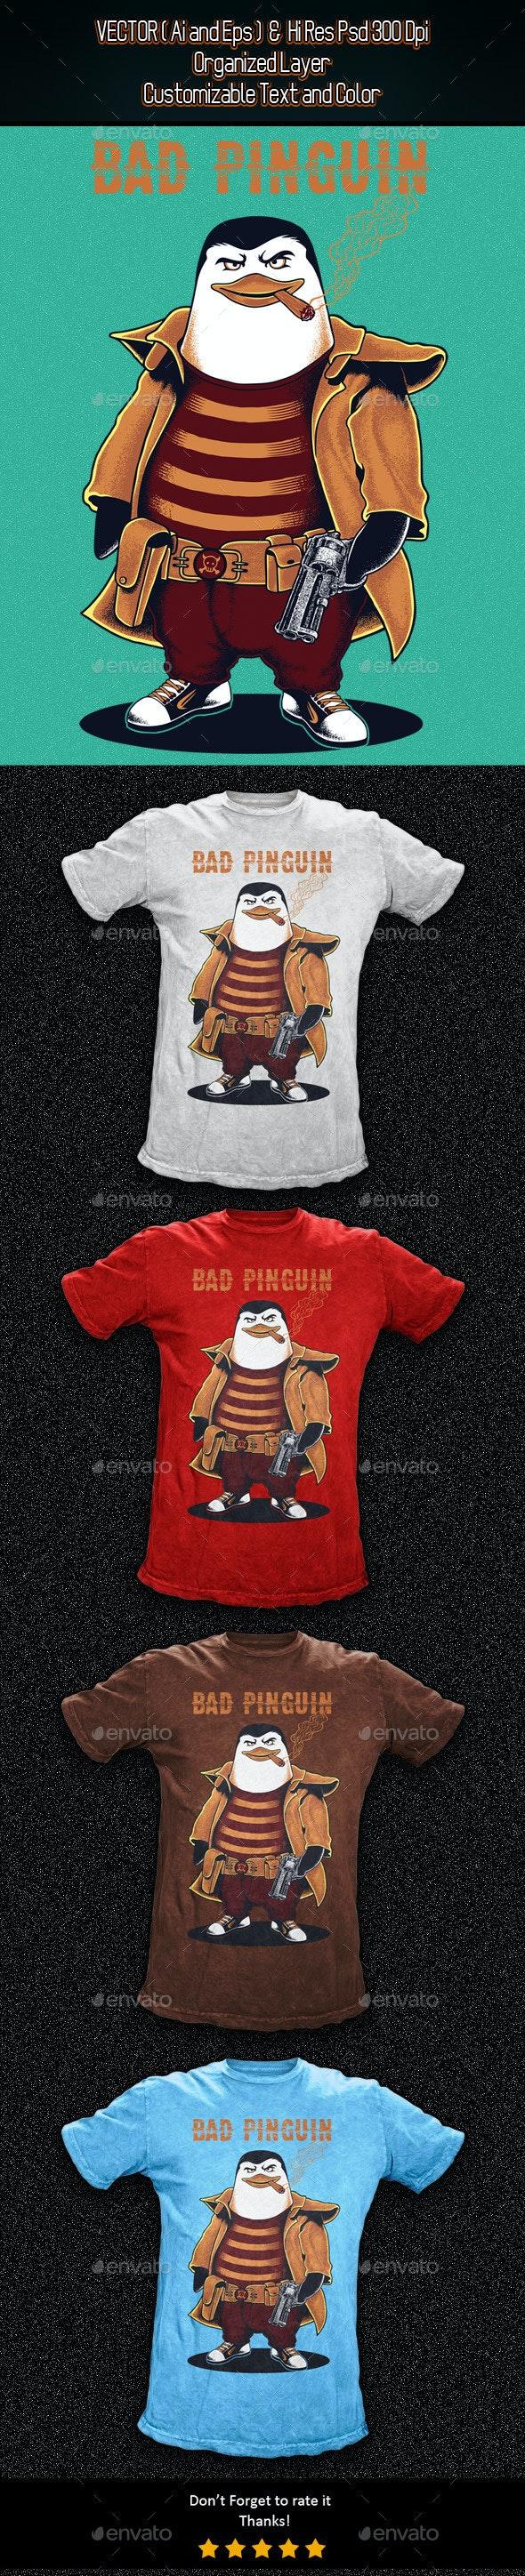 Bad Pinguin - Funny Designs